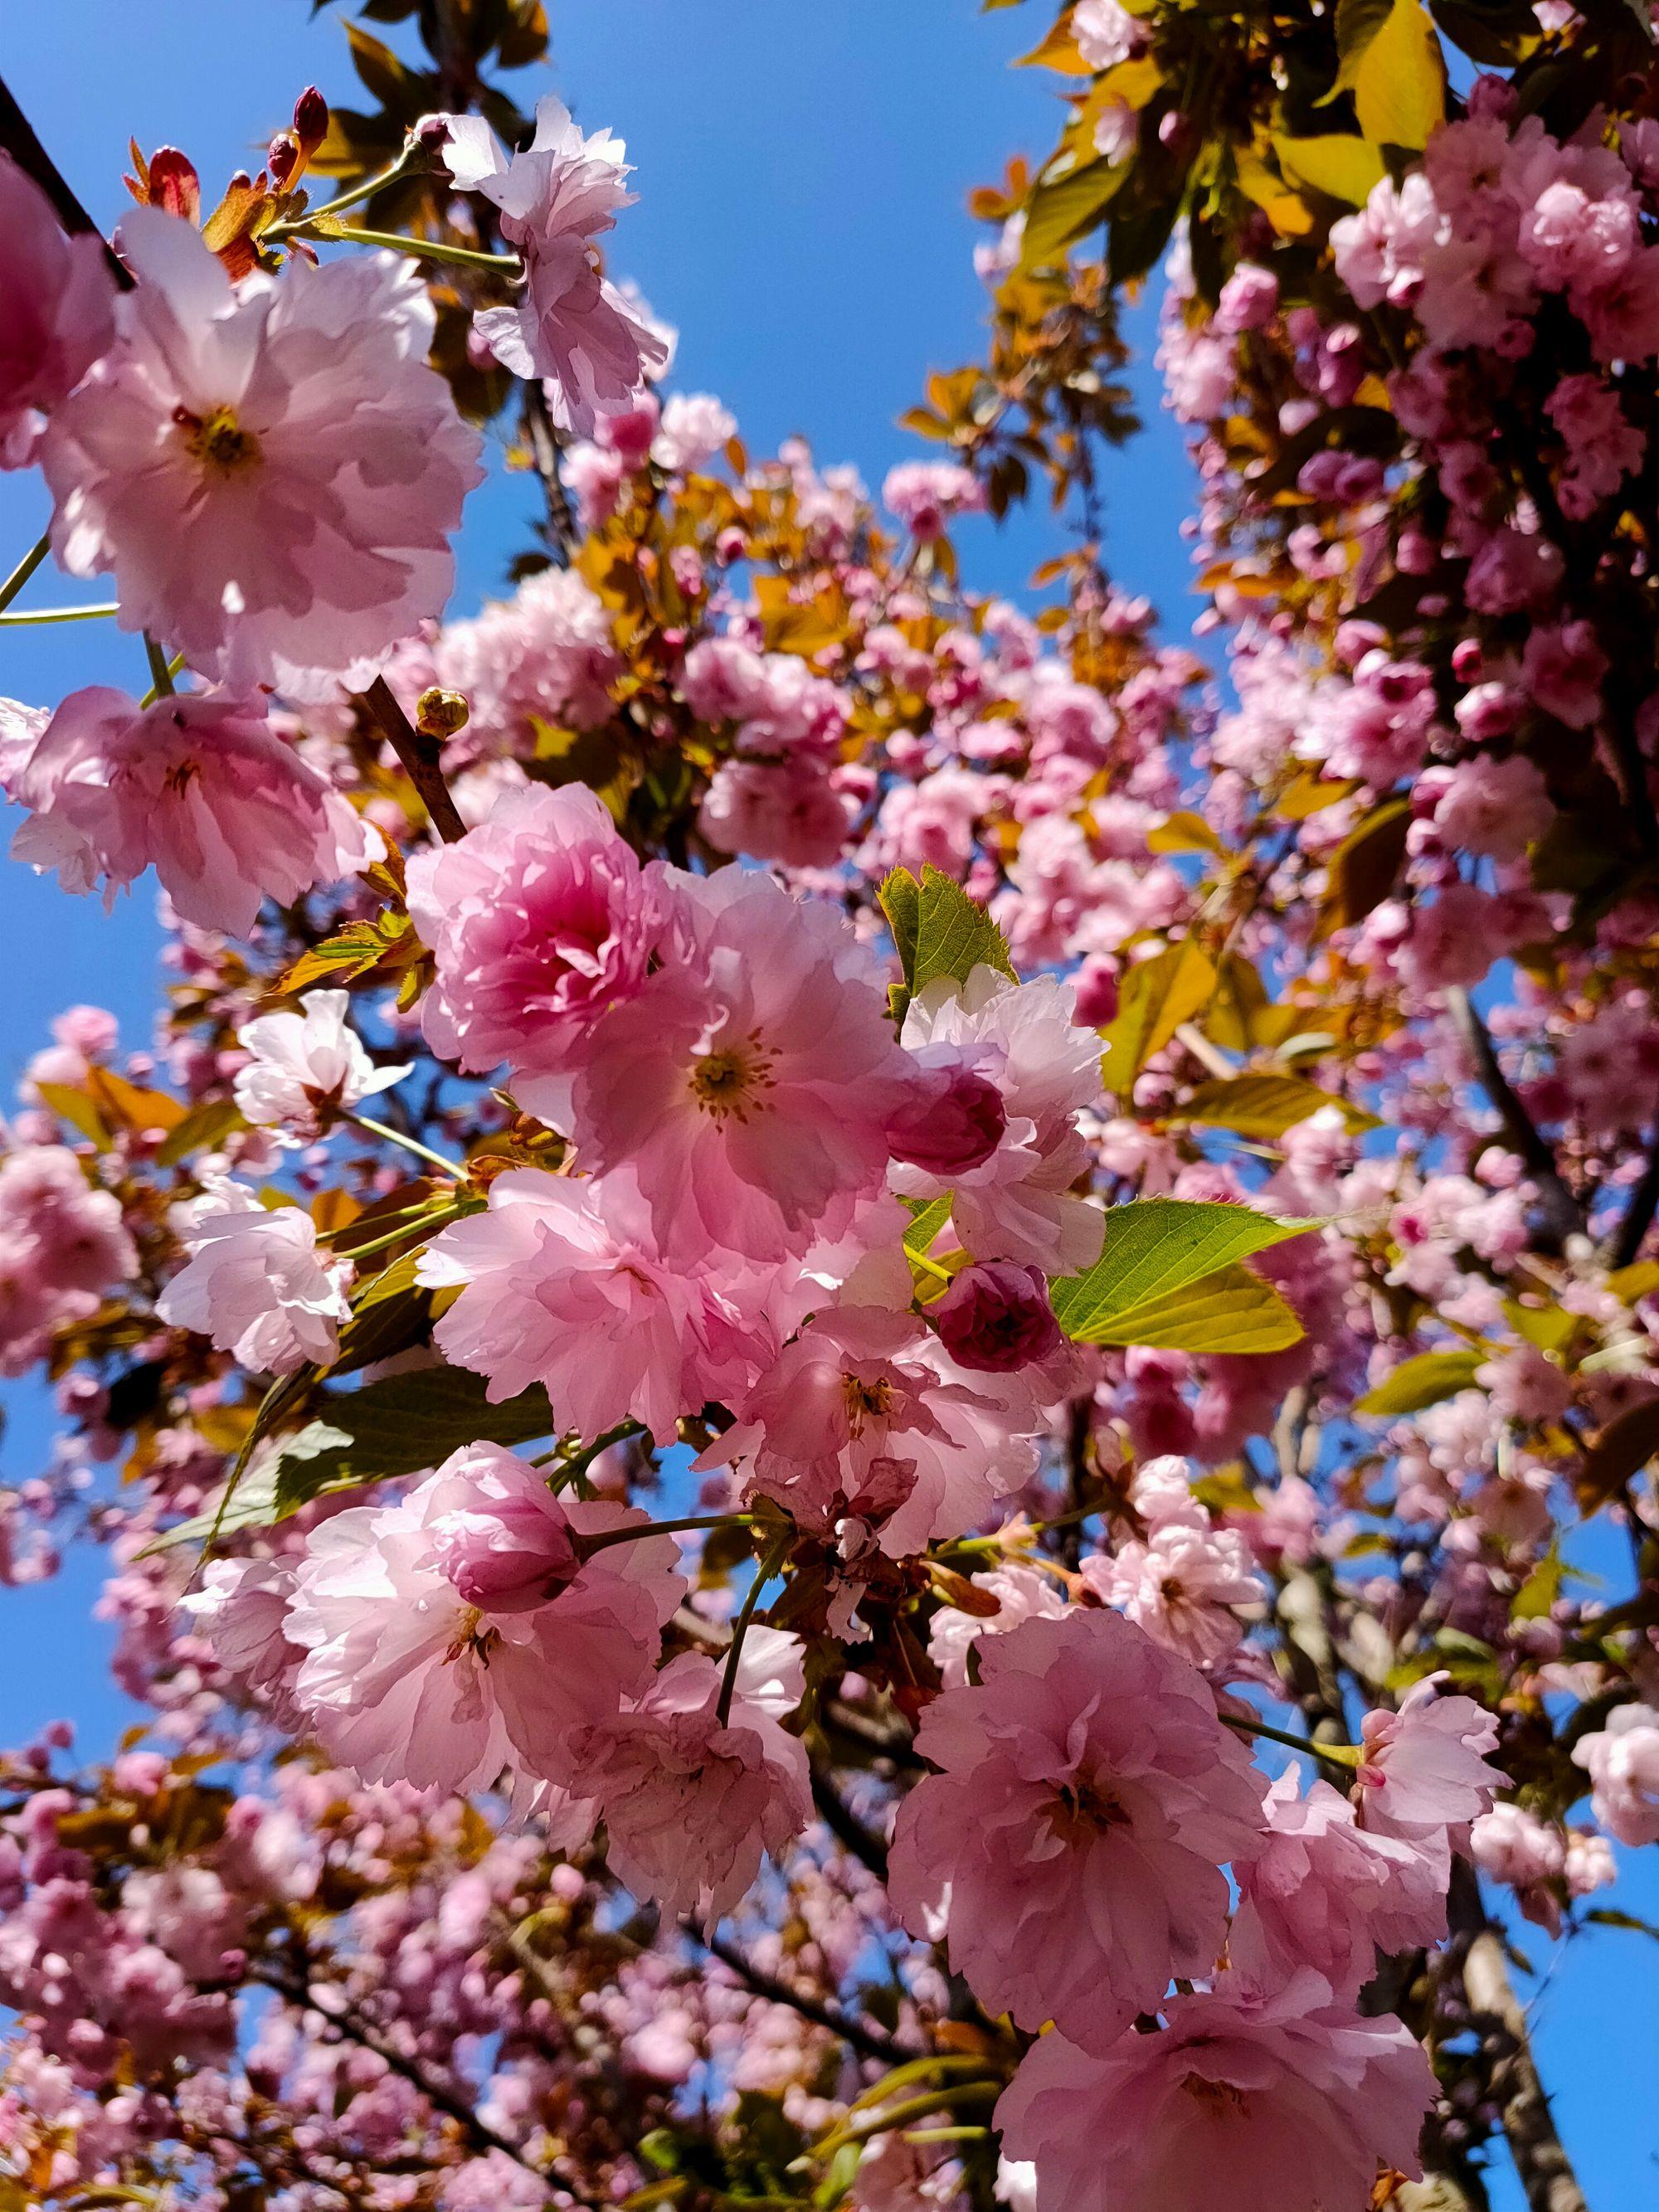 Prunus Serrulata Kanzan Prunus Serrulata Ornamental Cherry Flowering Trees